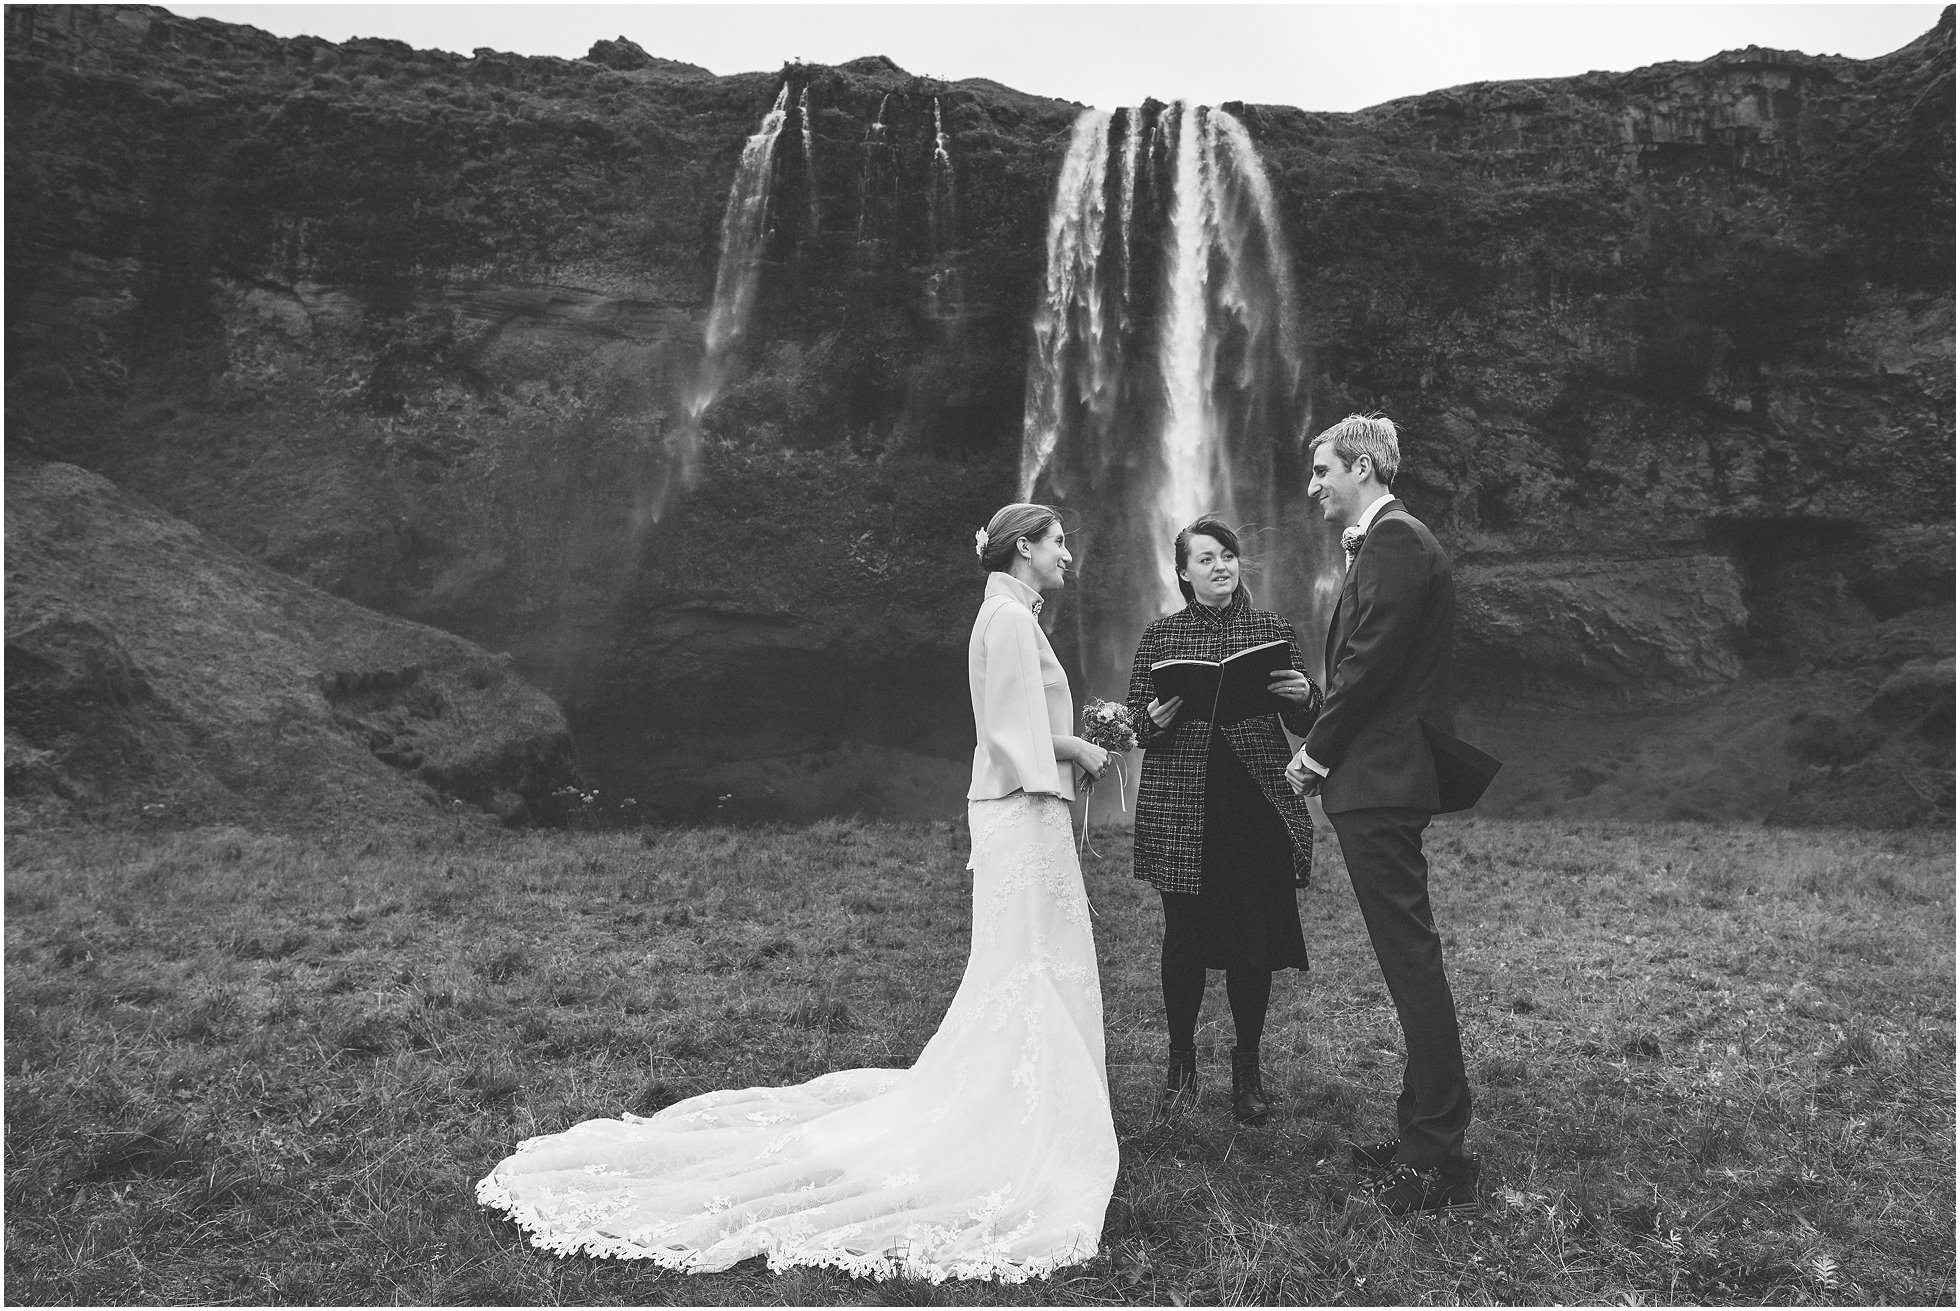 Wedding ceremony in front of Seljalandsfoss Iceland